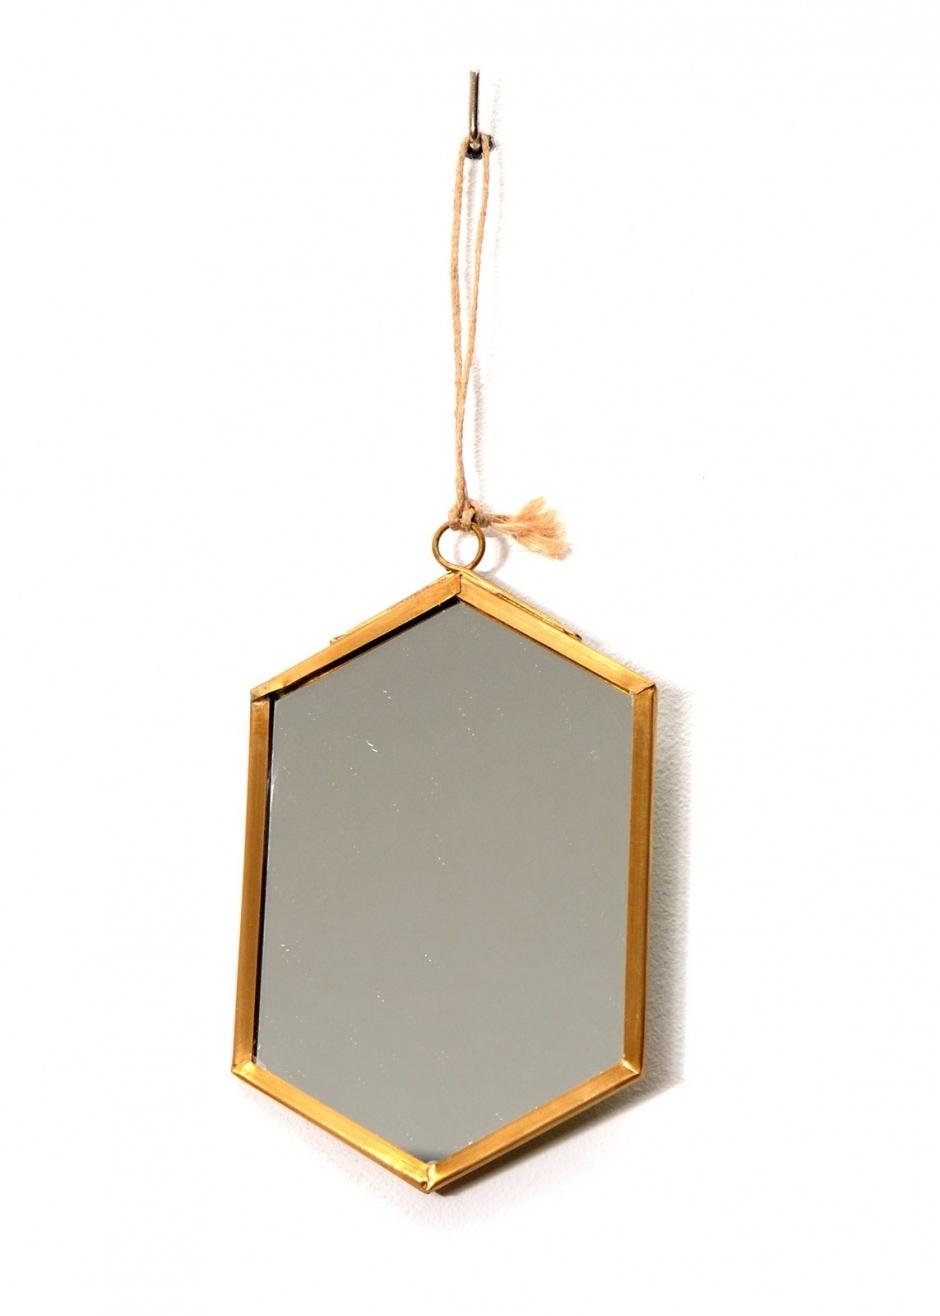 miroir mini hexagonal d co baobab d co baobab. Black Bedroom Furniture Sets. Home Design Ideas